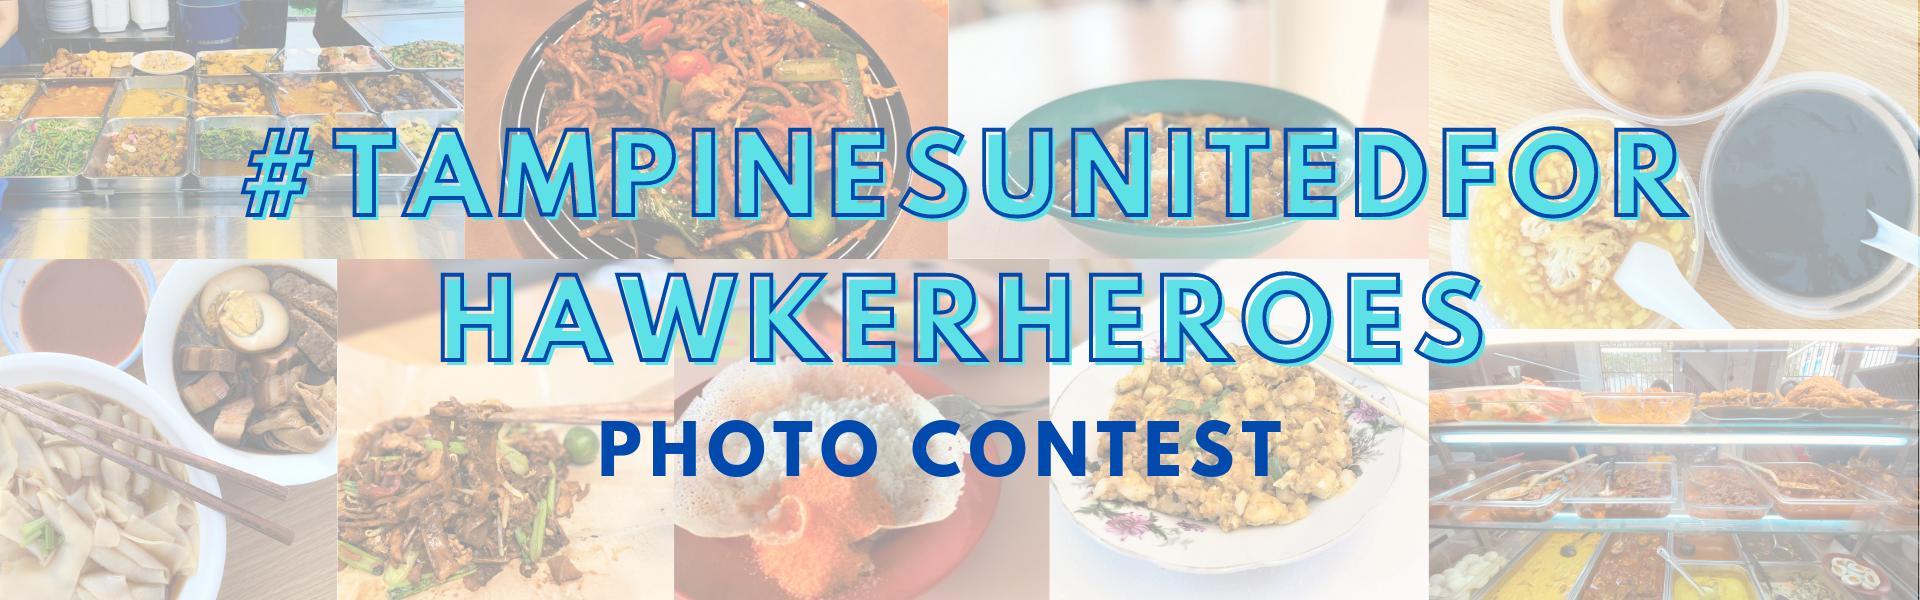 #TampinesUnitedforHawkerHeroes Photo Contest